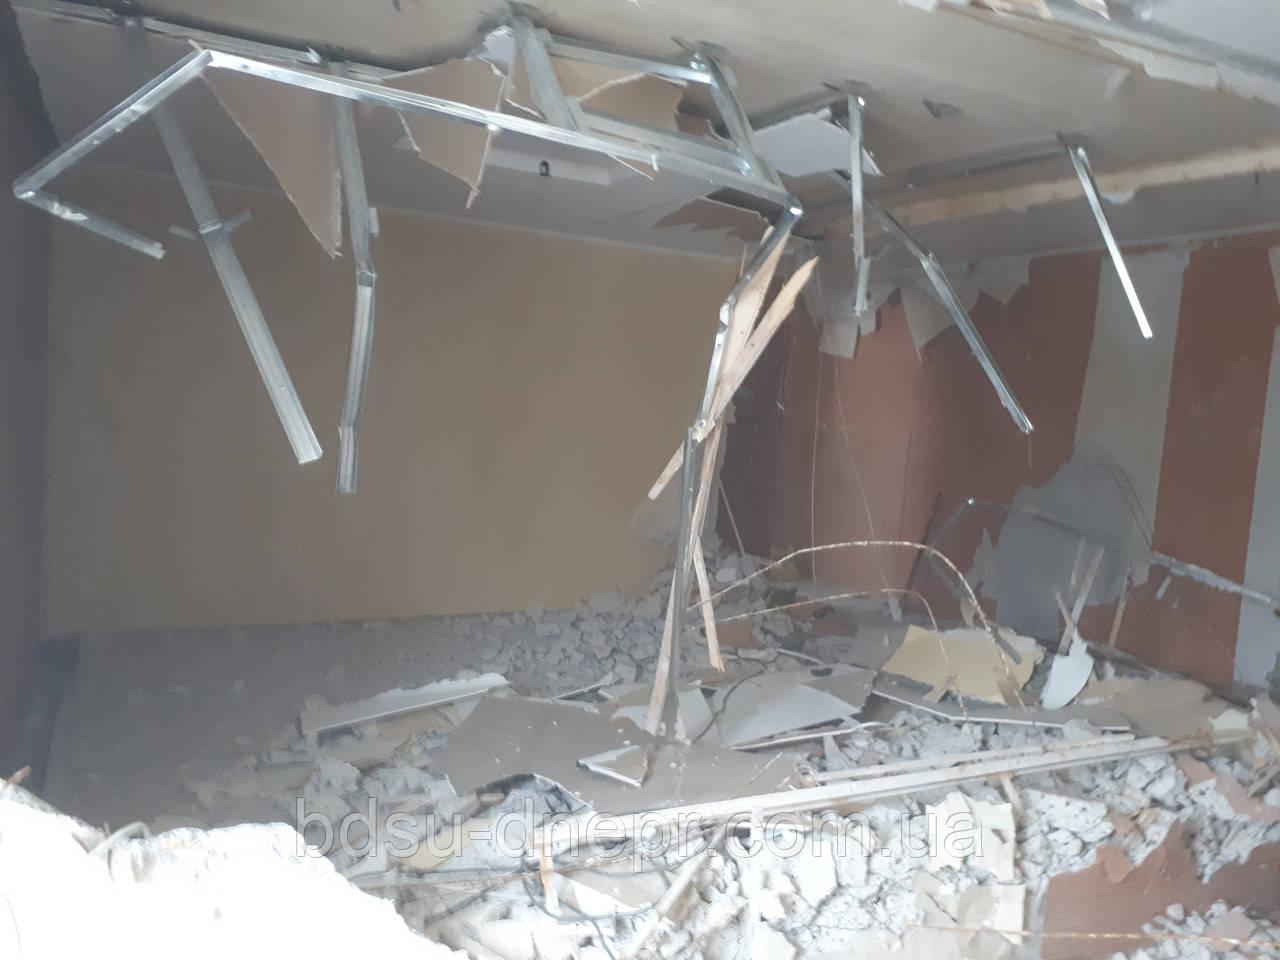 Демонтаж в Днепропетровске